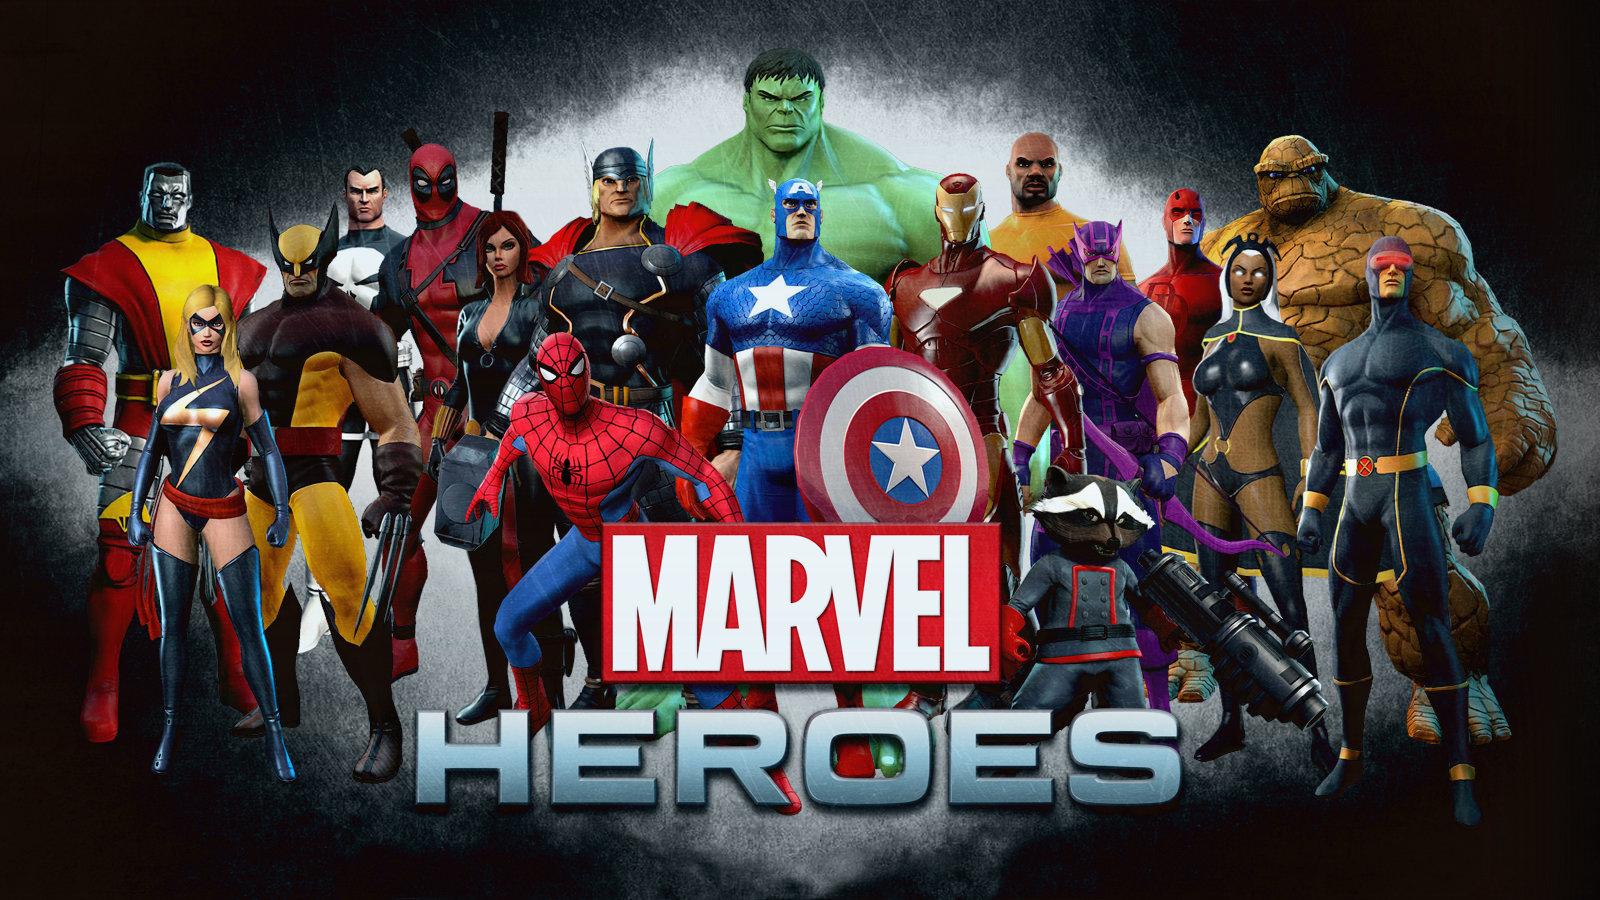 Marvel Heroes Wallpapers Hd For Desktop Backgrounds